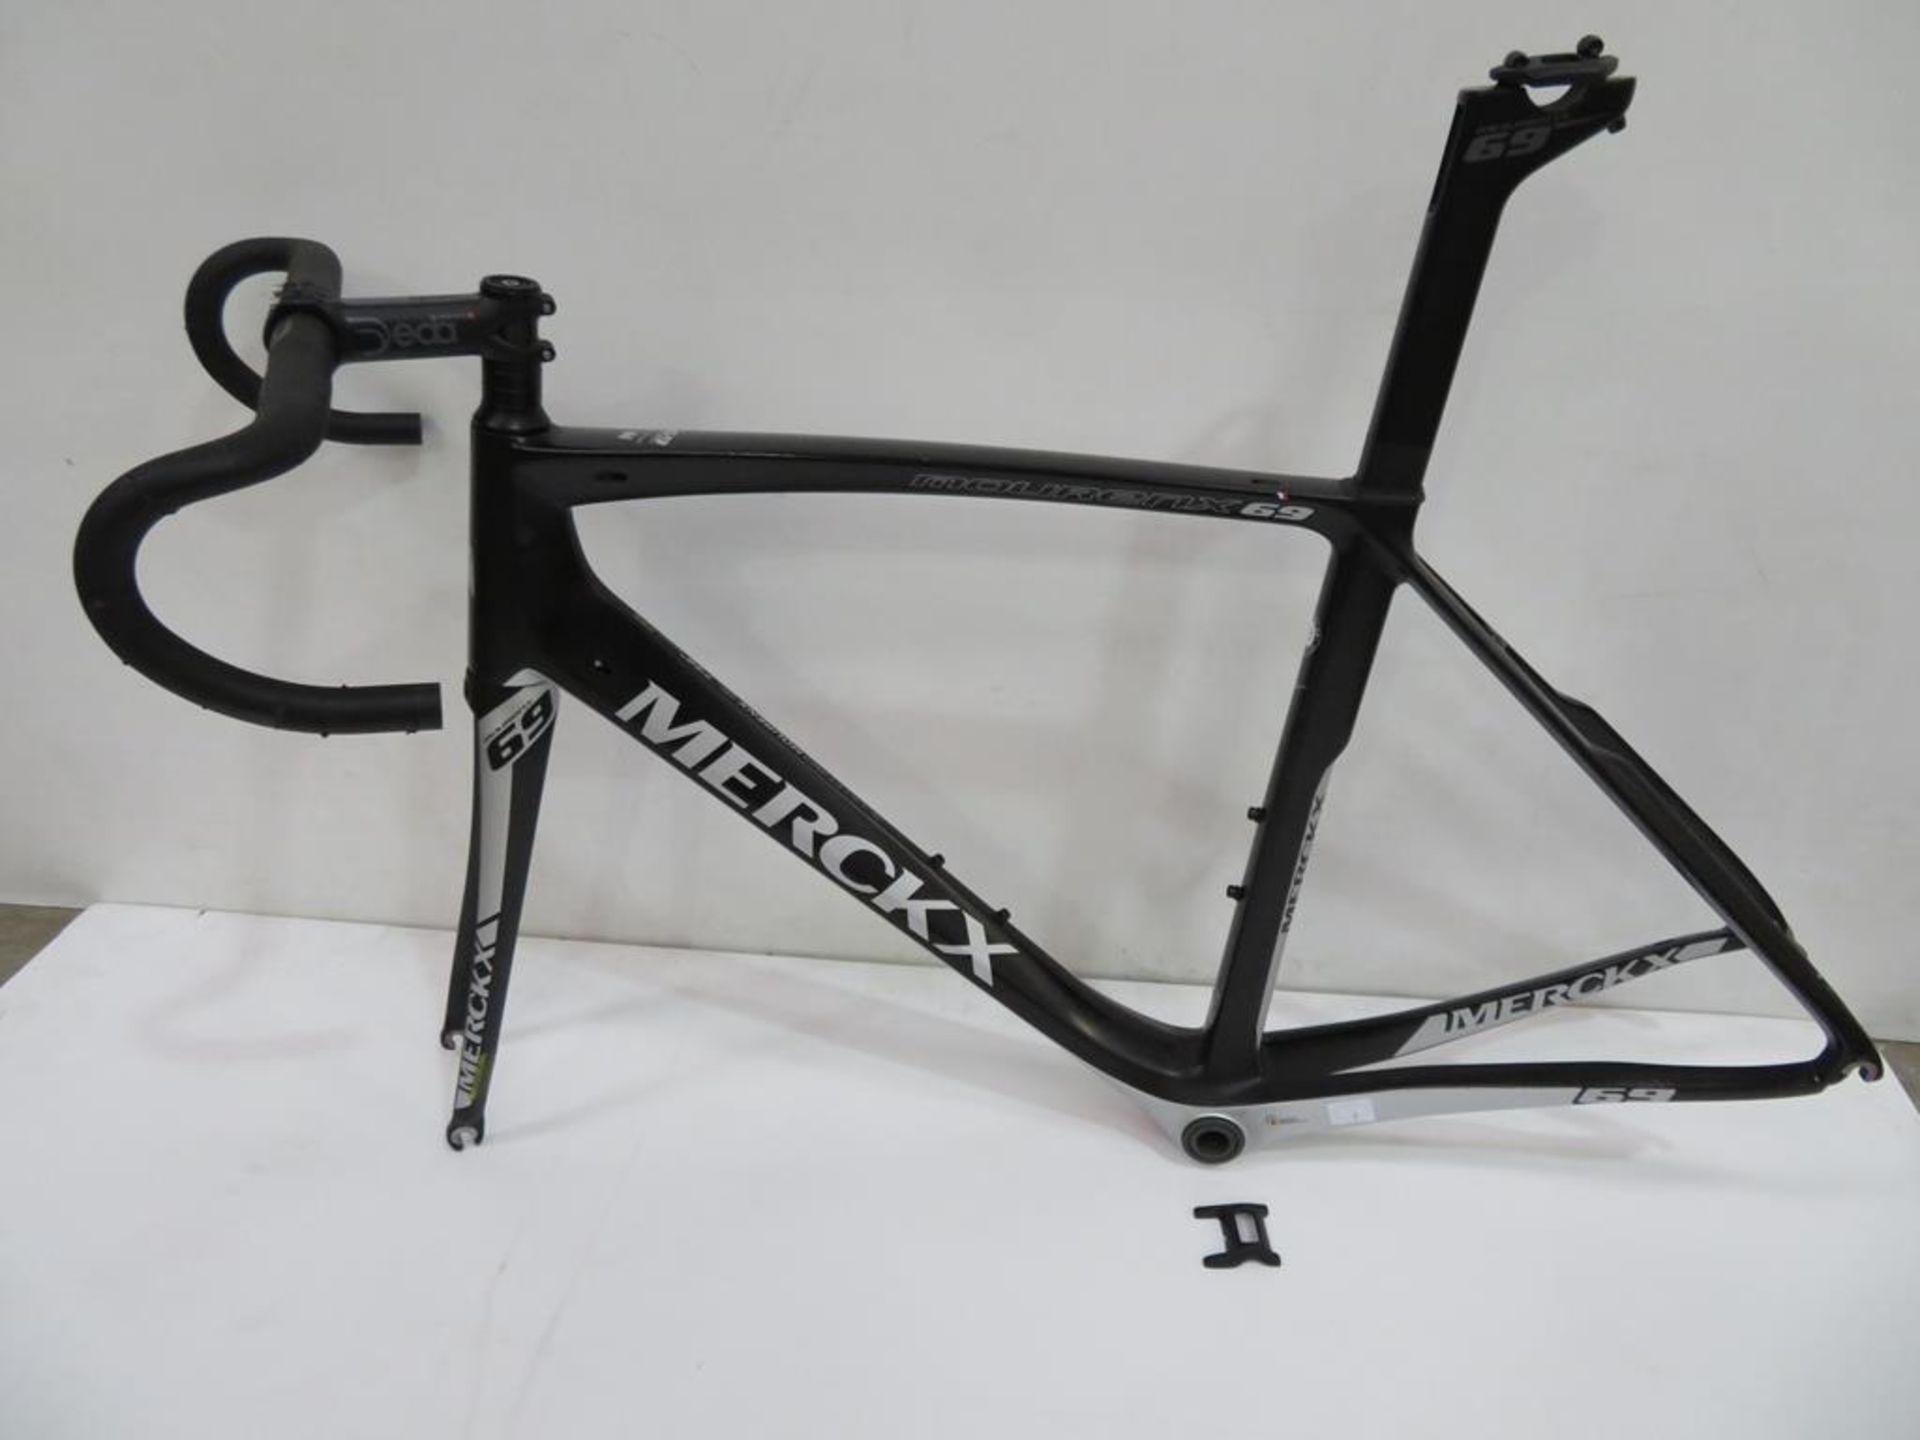 Lot 3 - Eddy Merckx Mourenx 69 Carbon Bike Frame